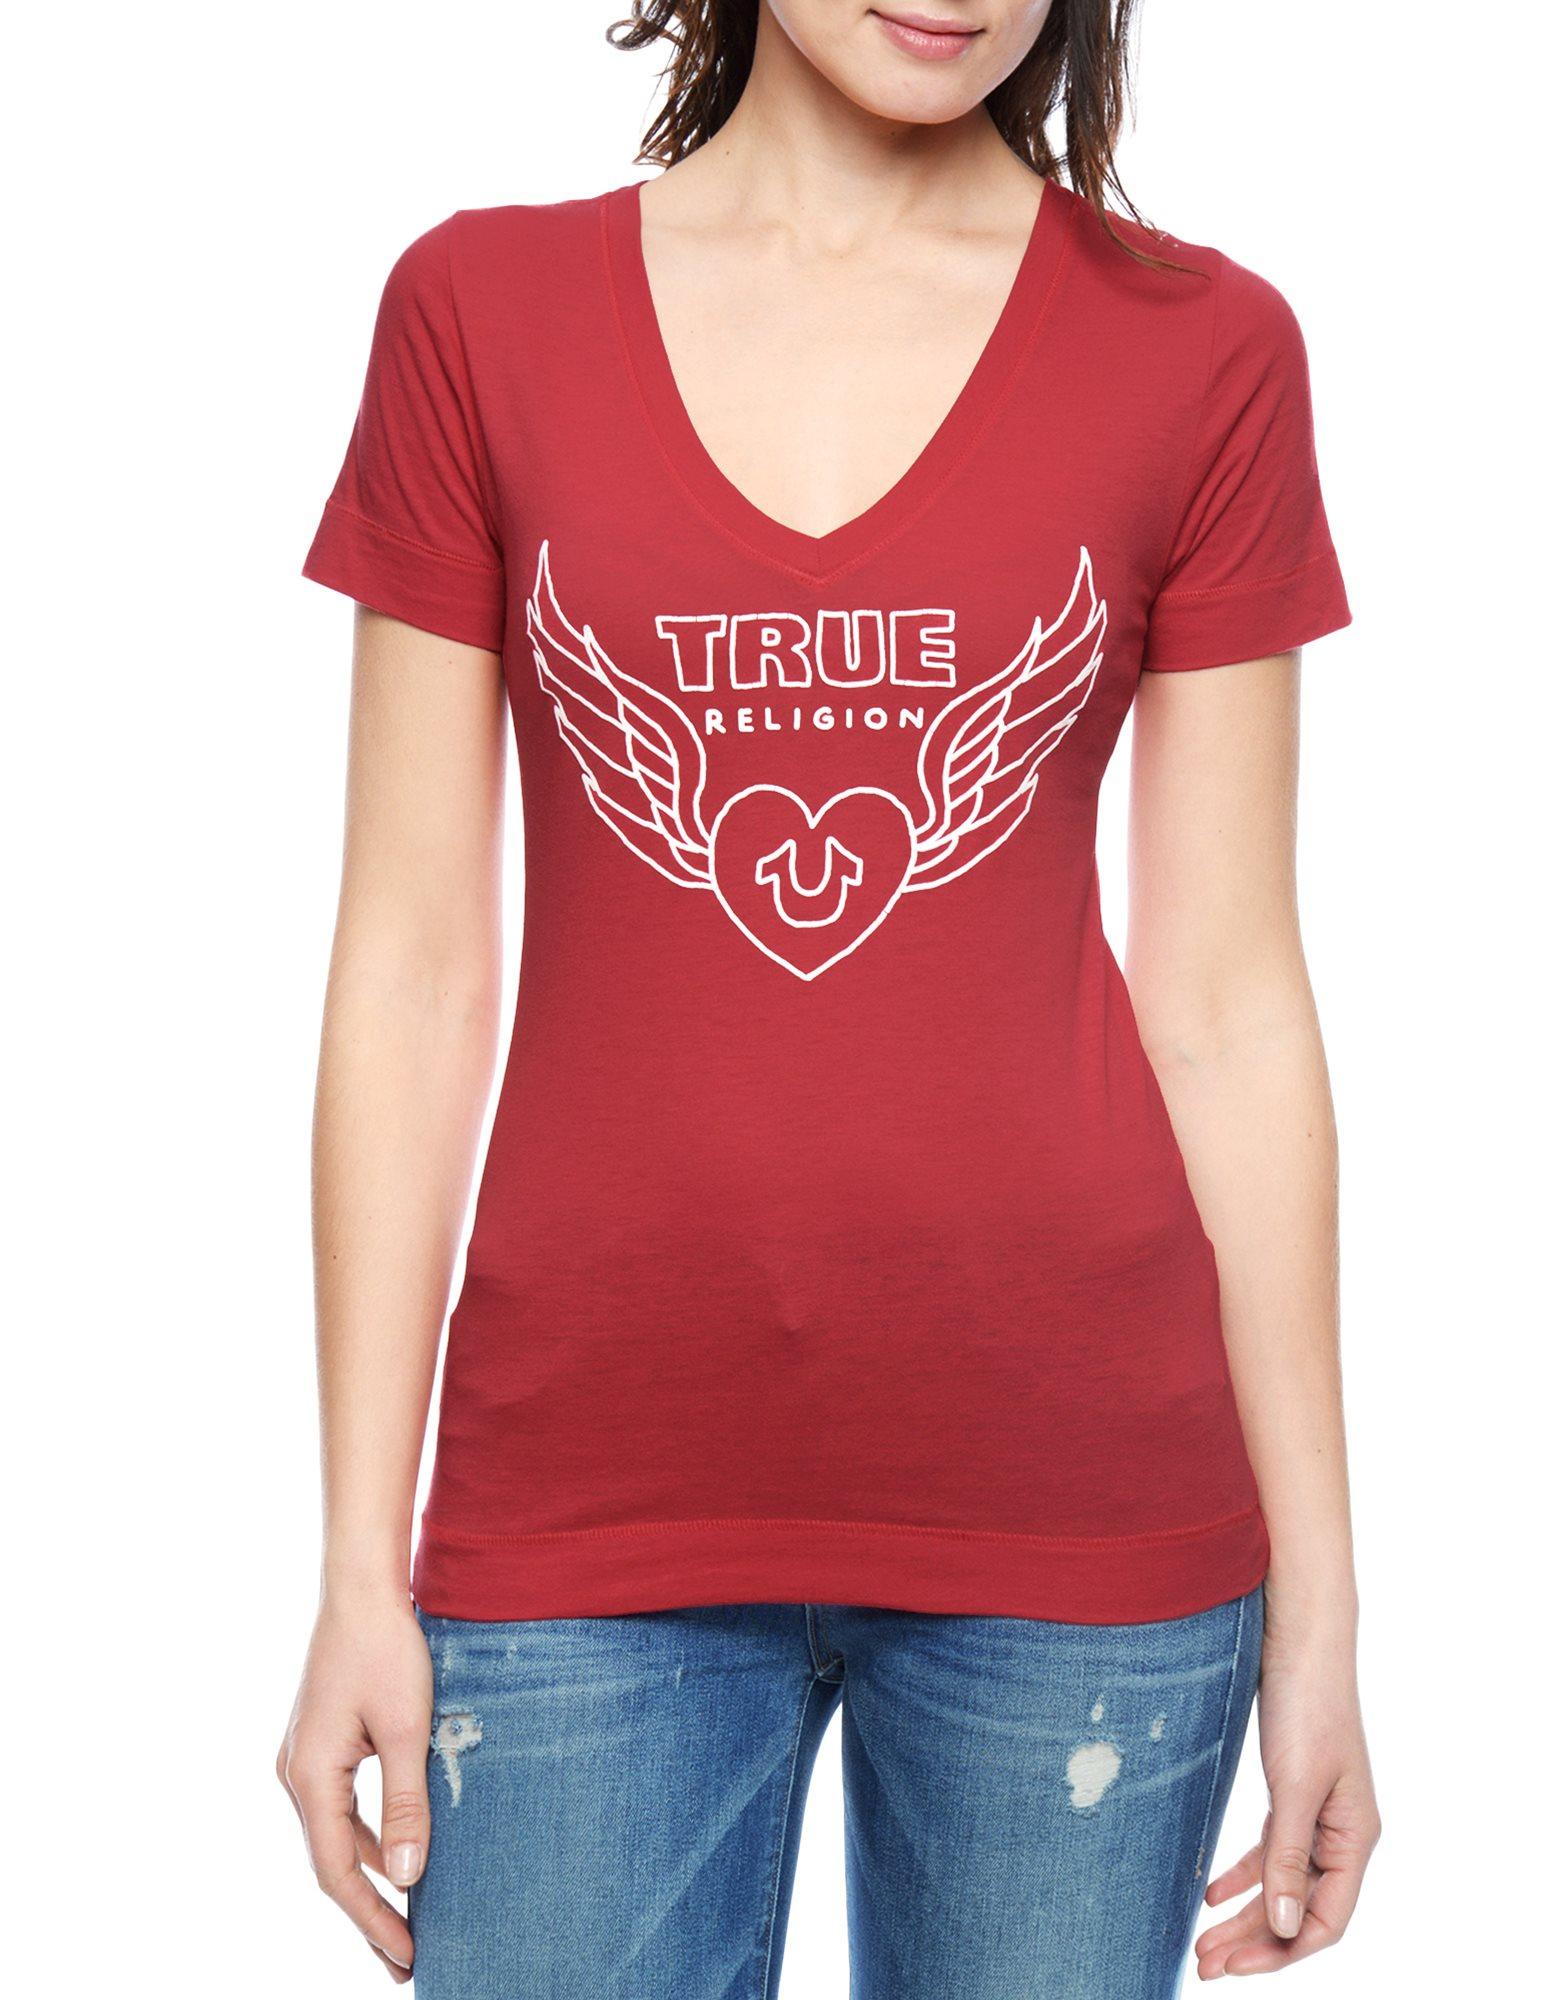 true religion heart slim womens t shirt in red lyst. Black Bedroom Furniture Sets. Home Design Ideas